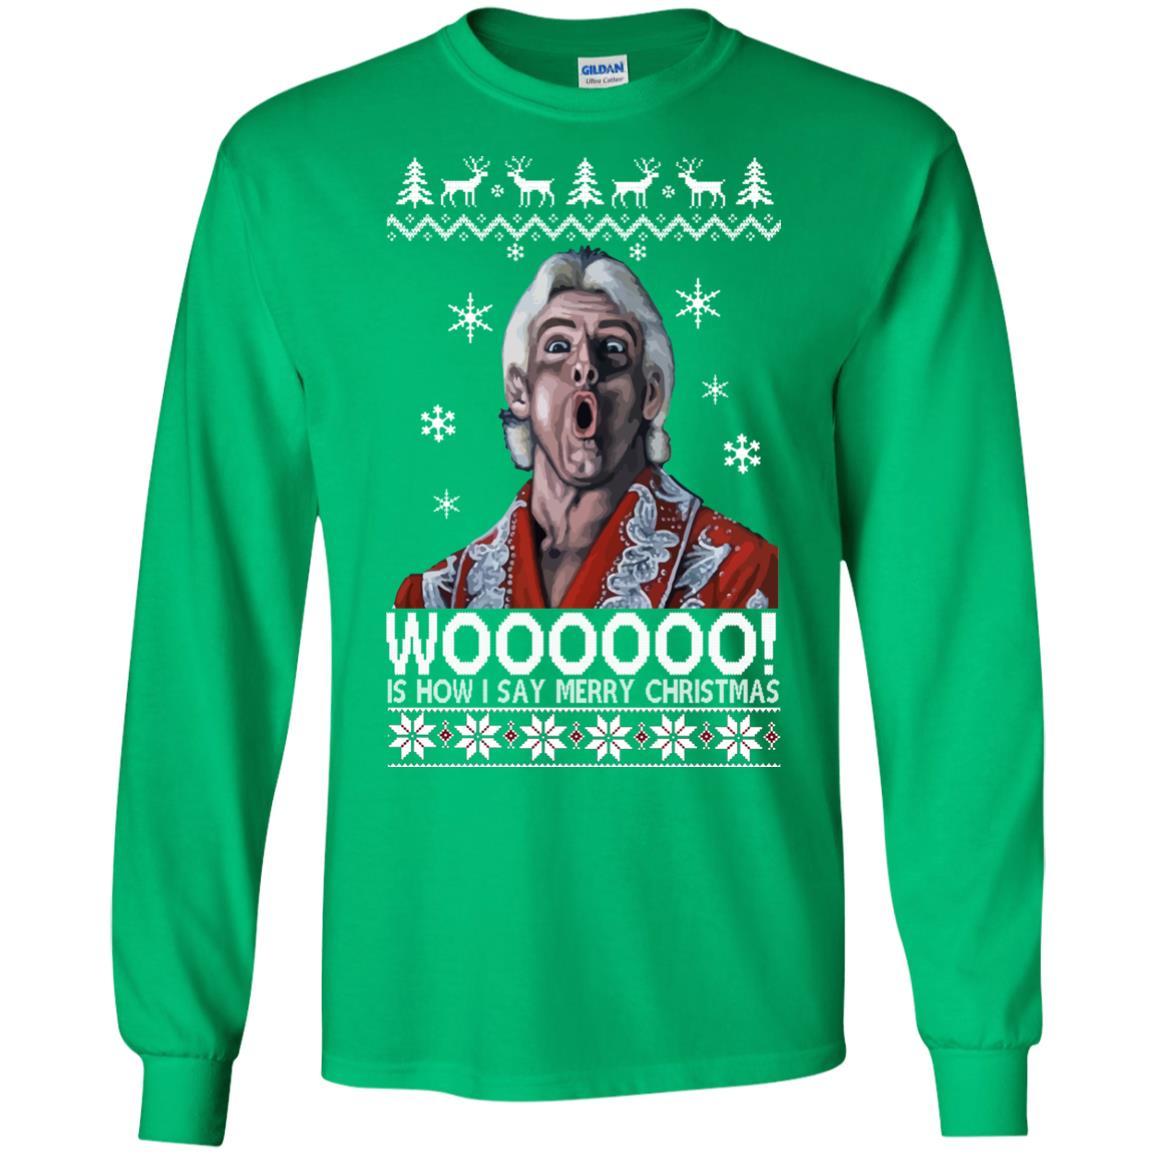 image 1638 - Green Ric Flair WOO Christmas Sweater, Ugly Sweatshirt